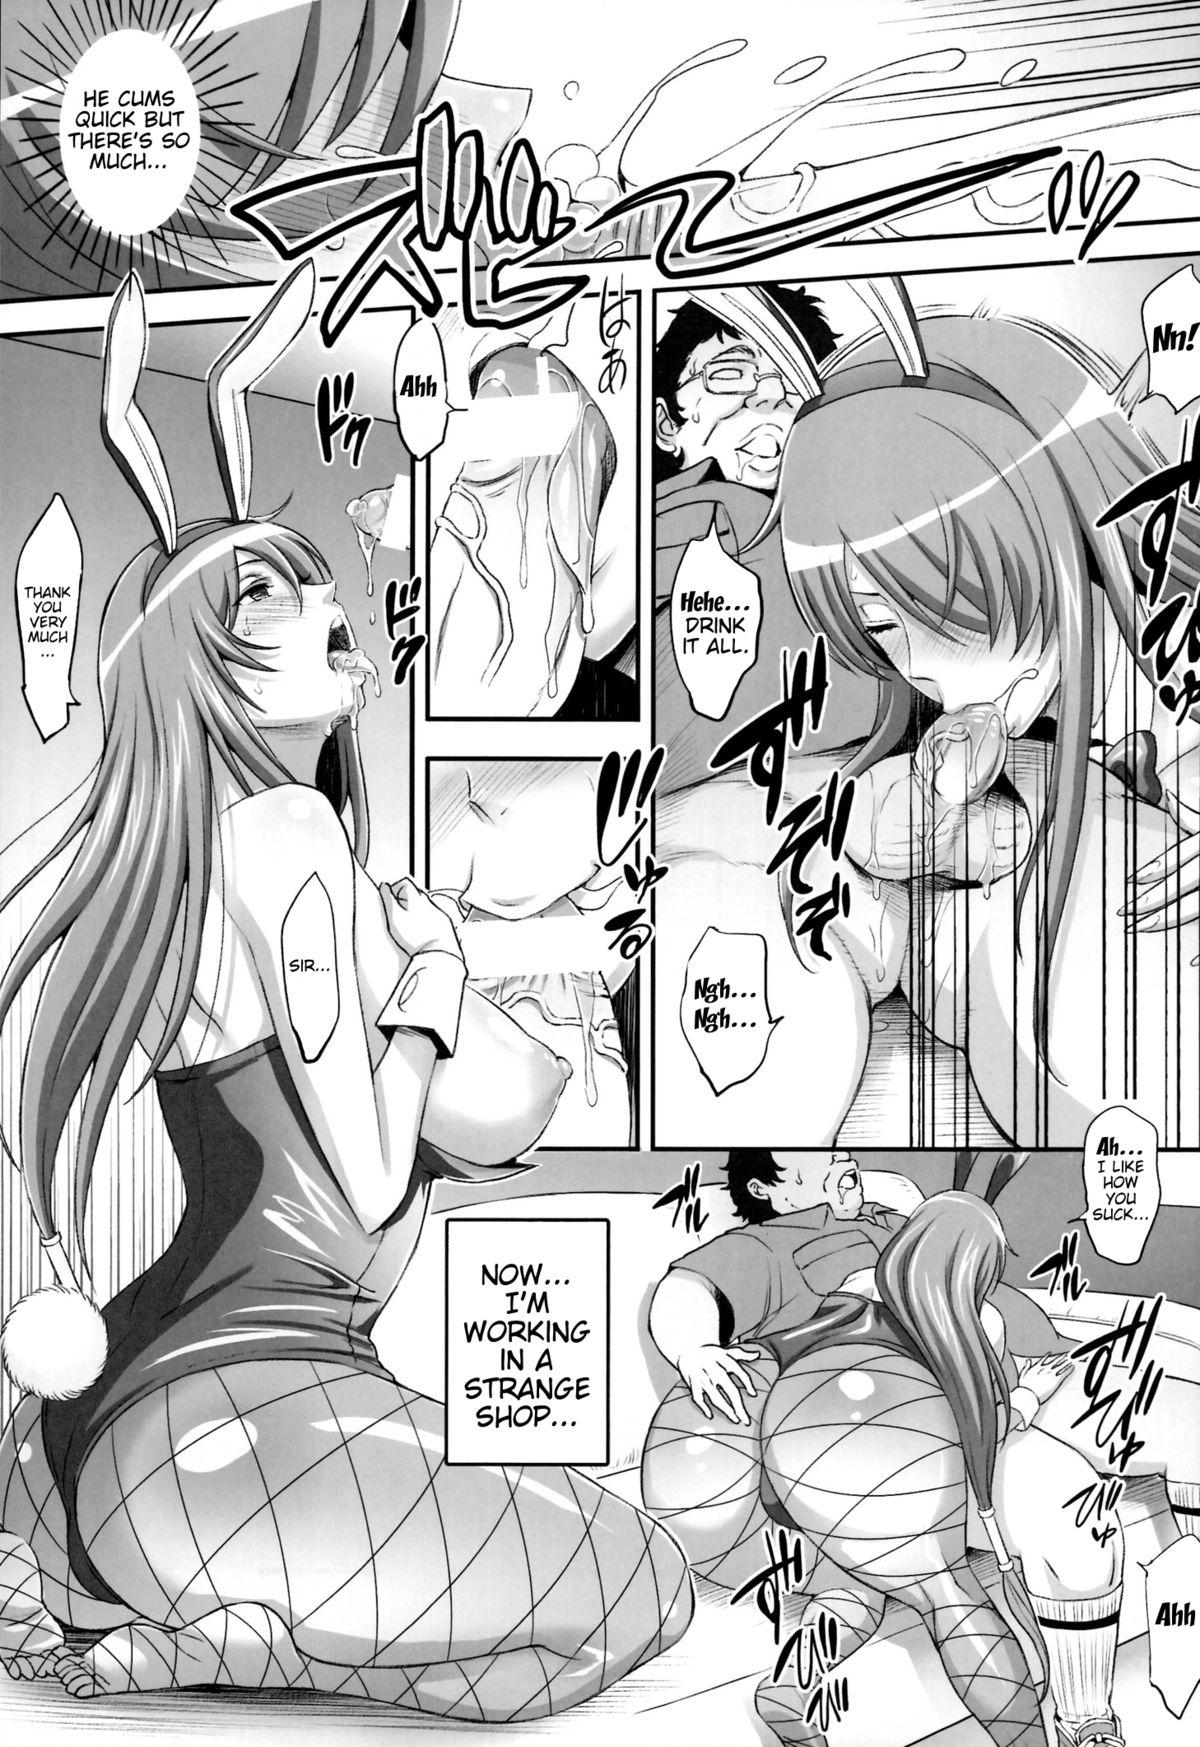 (C86) [Diogenes Club (Haikawa Hemlen)] Shokukan Mankan Zenseki Go Touki Ryoujoku   Shokukan Mankan Zenseki 5 - Princess Rape Battle- Cosplay Kanu (Ikkitousen) [English] {doujin-moe.us} 5